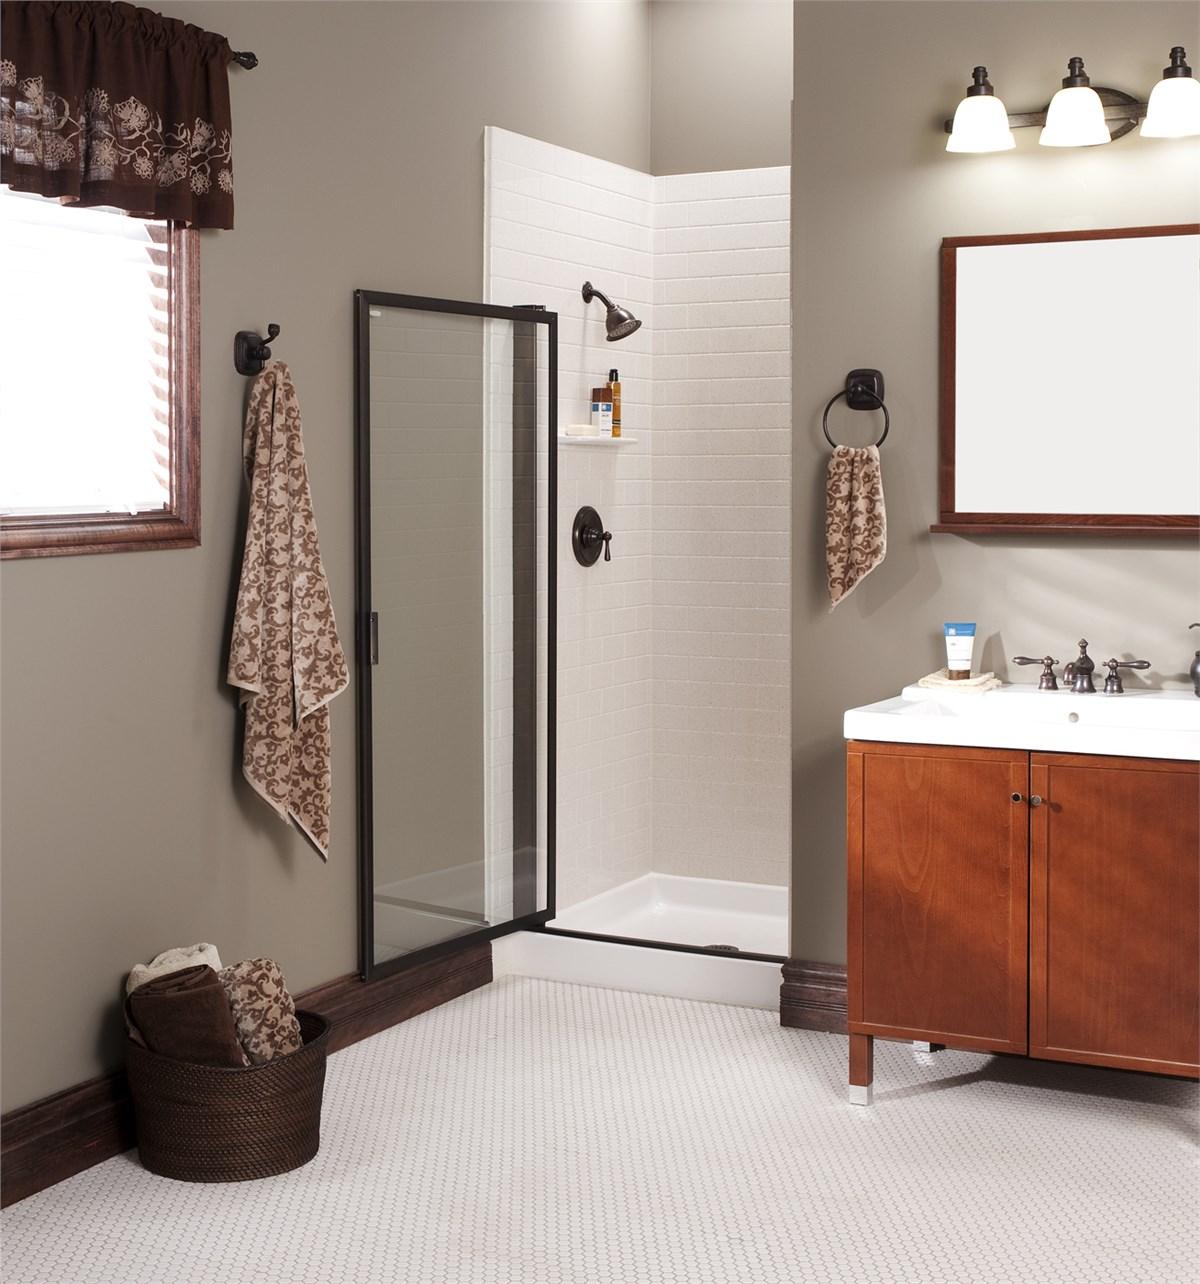 Bathroom Remodeling FAQs Green Bay Bathroom Remodeling